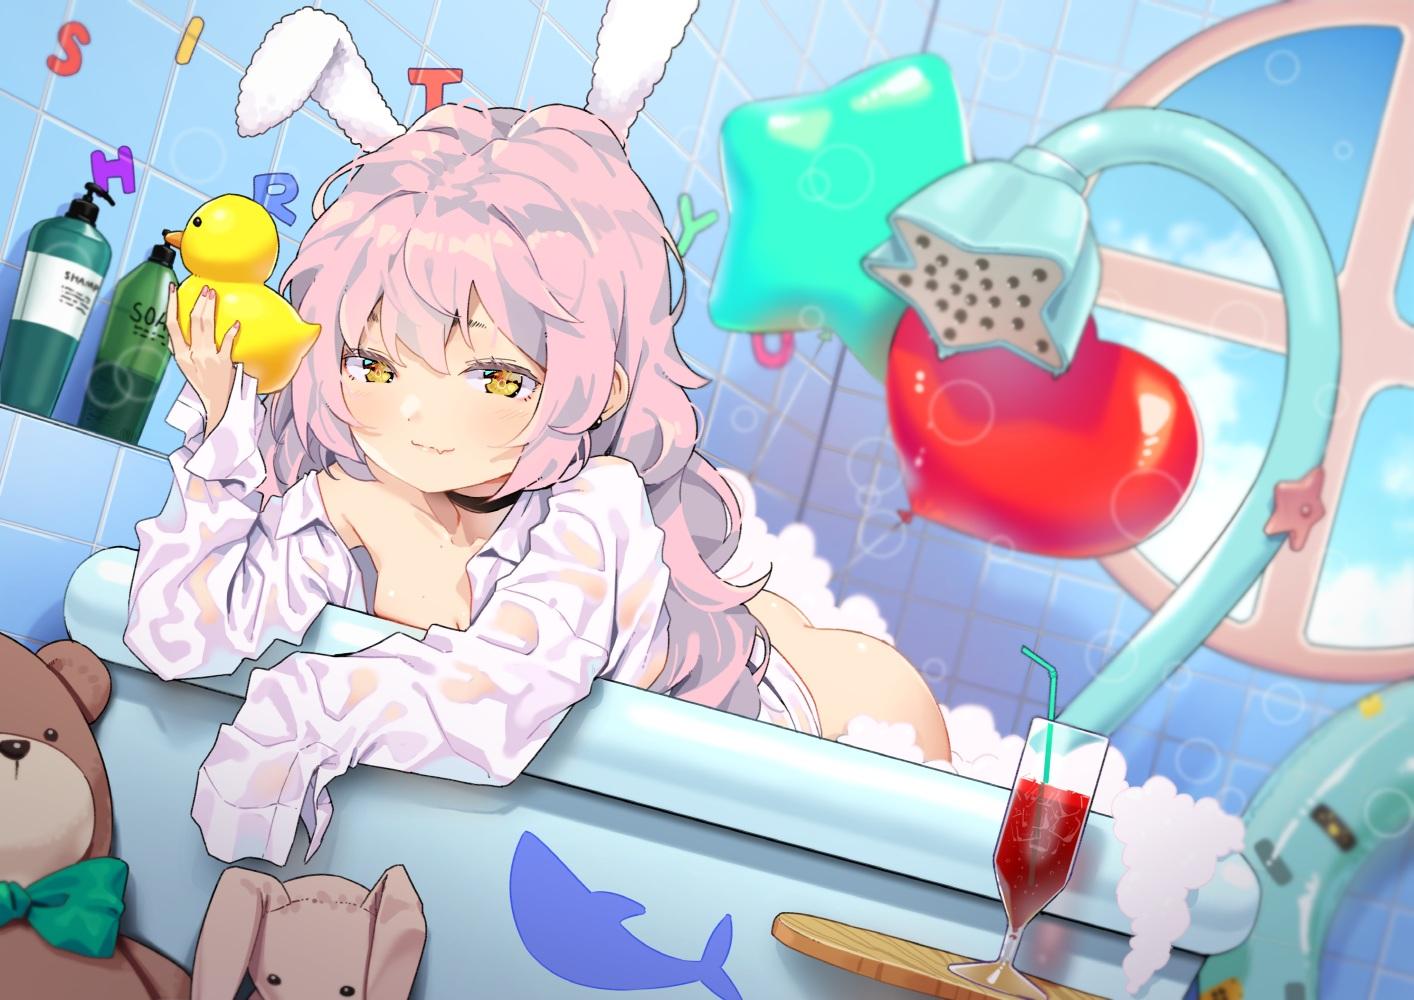 agnamore animal_ears anthropomorphism ass bath bathtub blue_oath bunny bunny_ears drink loli nopan open_shirt rubber_duck teddy_bear yuudachi_(blue_oath)